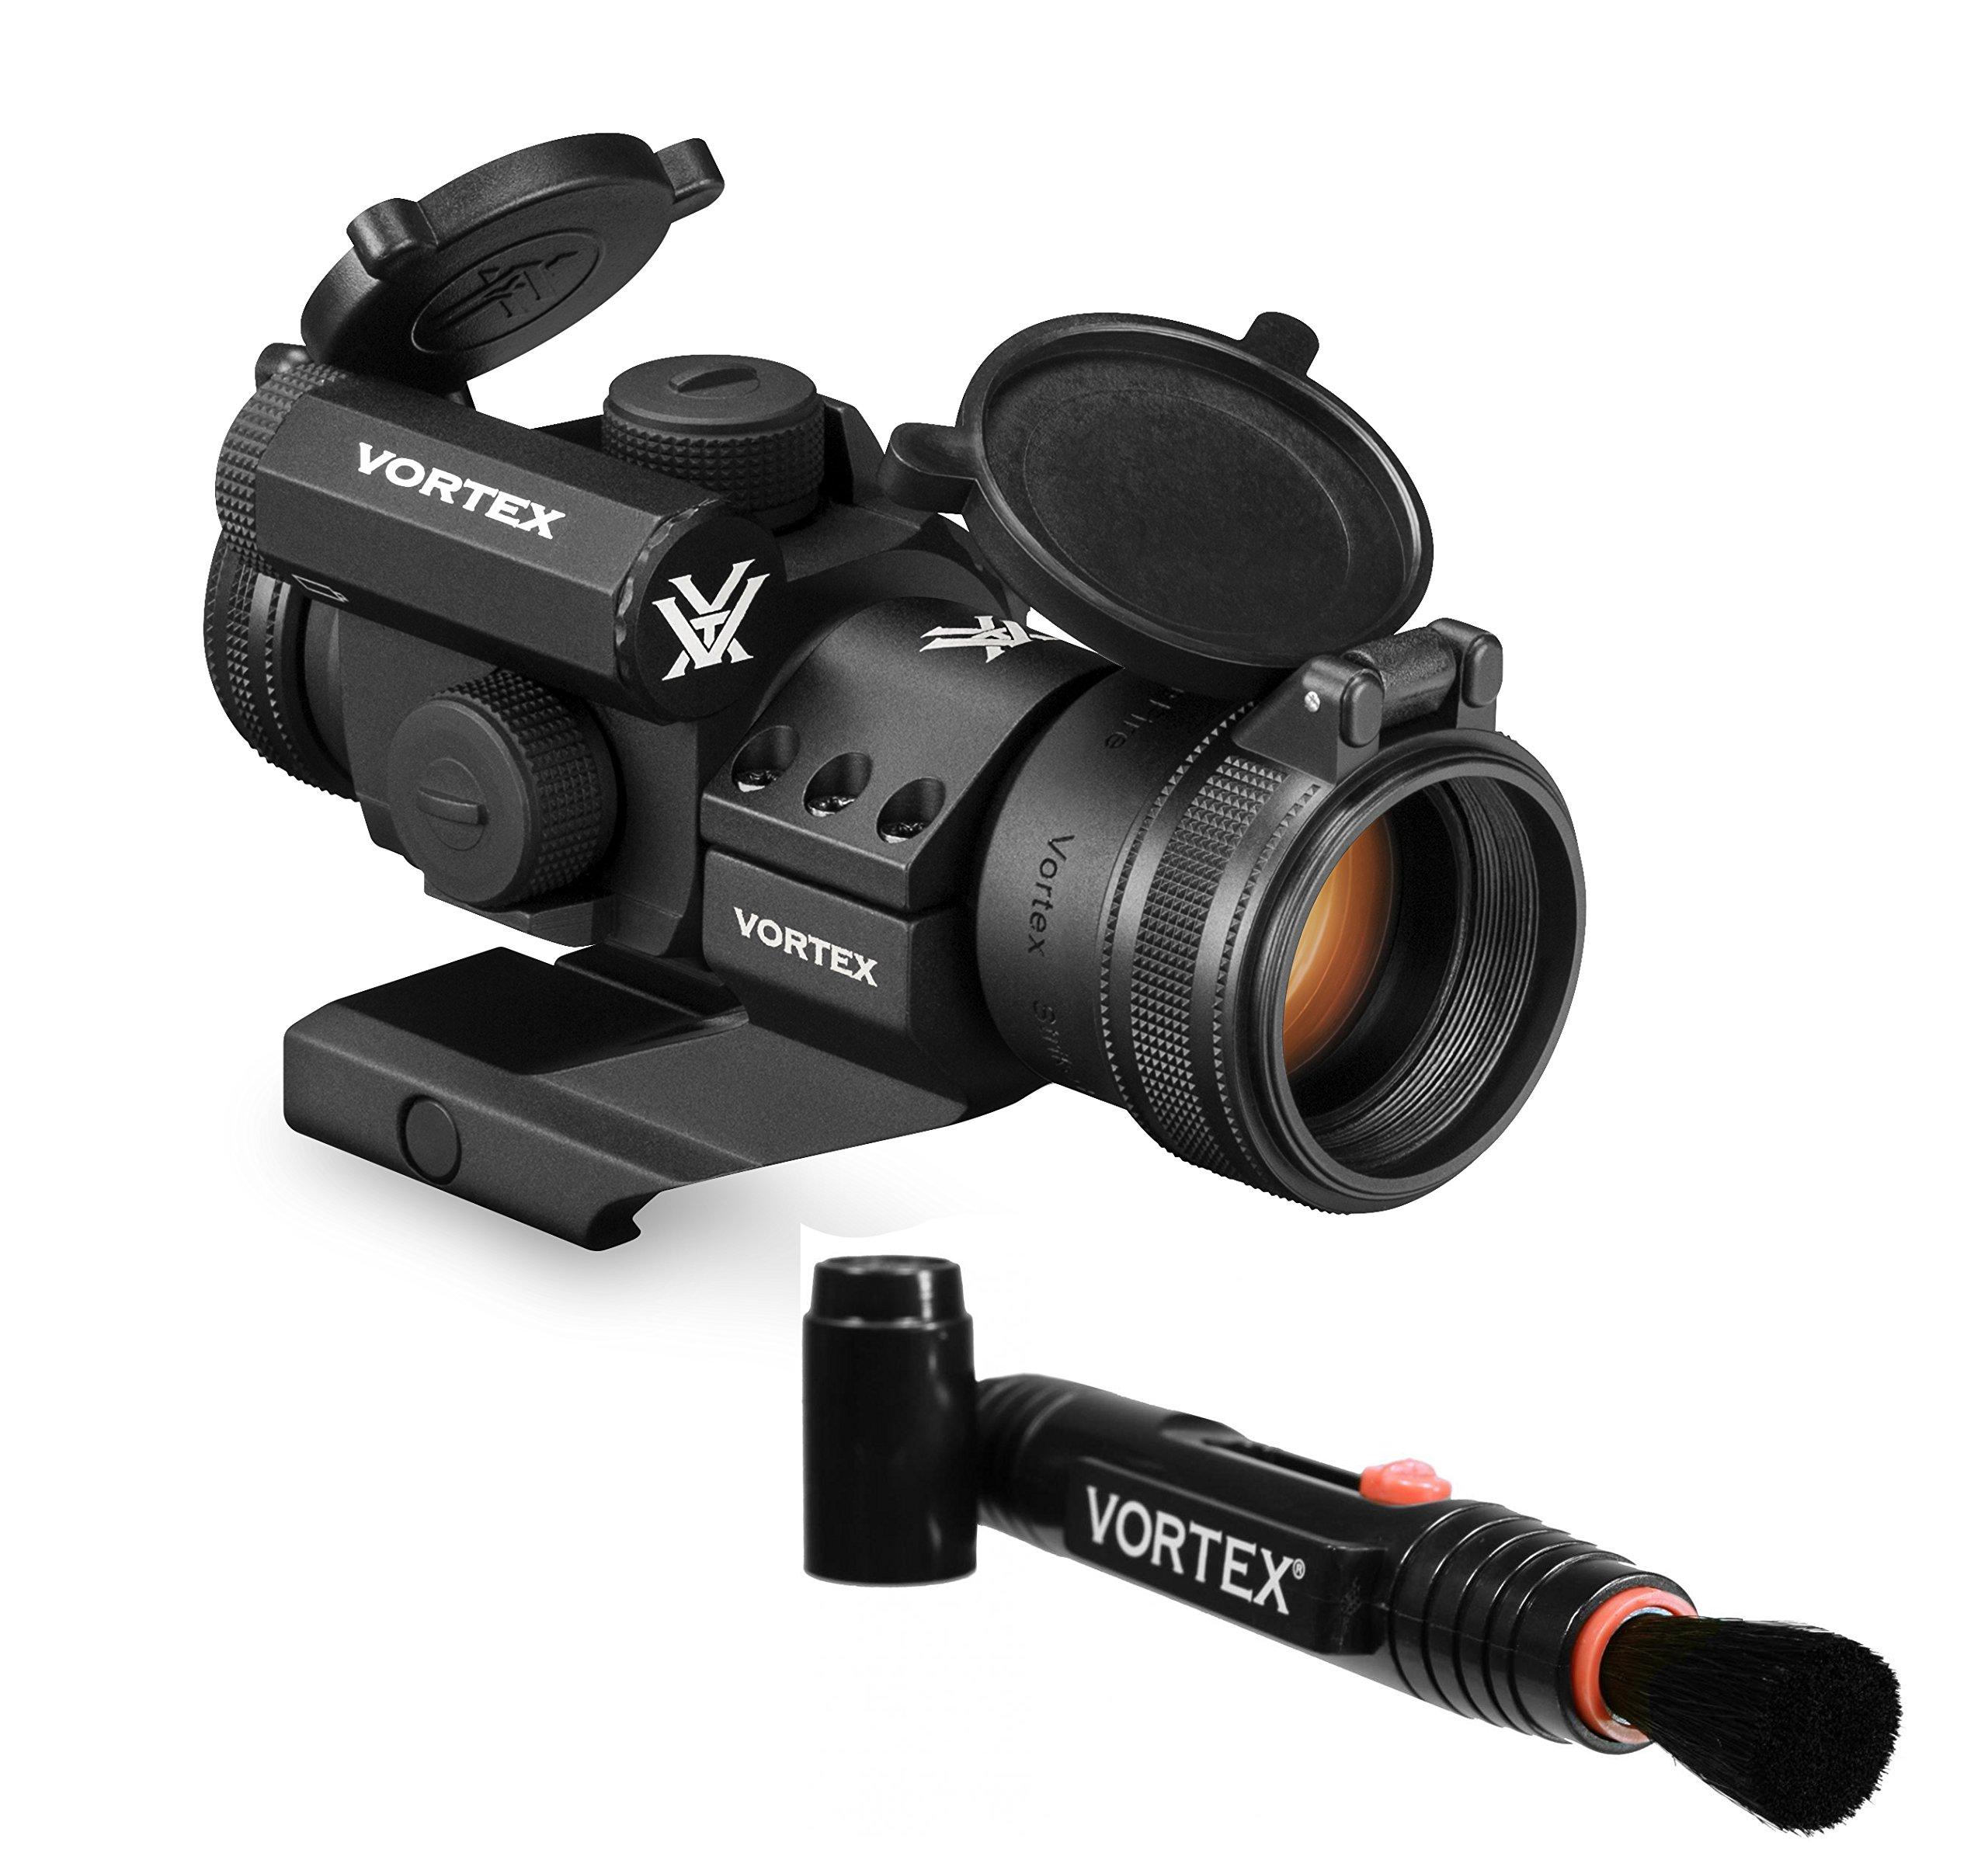 Vortex Optics StrikeFire 2 Red/Green Dot Sight with Cantilever Mount (SF-RG-501) and FREE Vortex Lens Pen by Vortex Optics